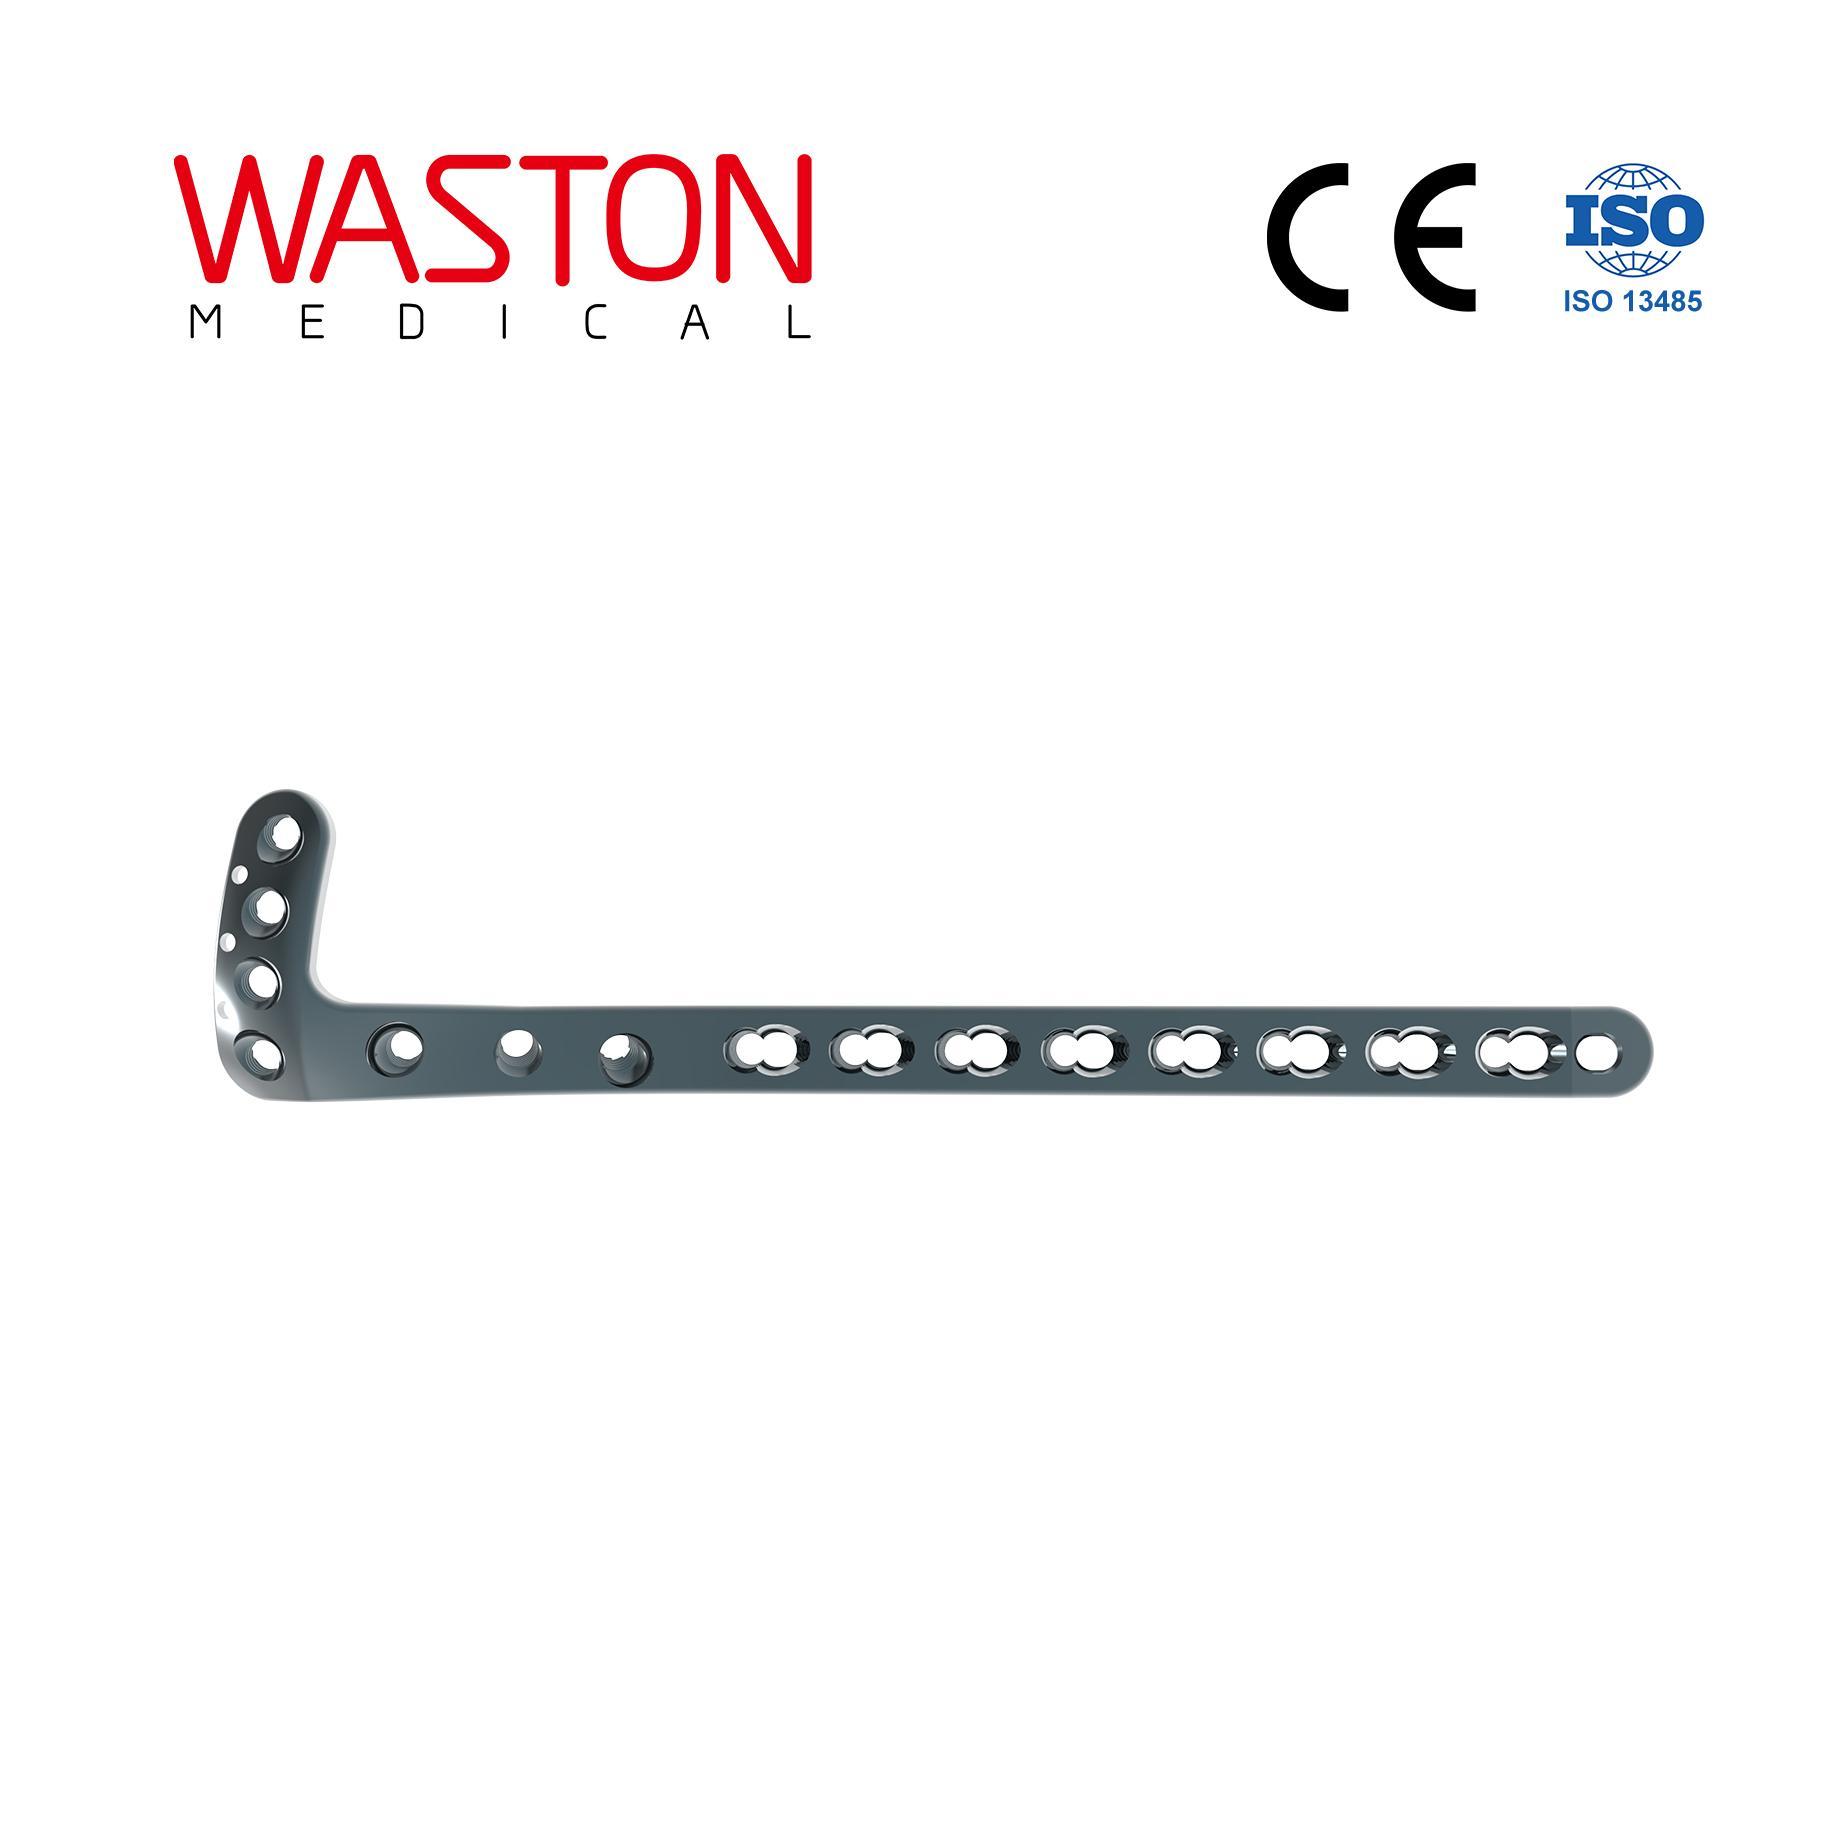 3.5mm/5mm L-buttress Locking Plate Orthopedic Implants Pure Titanium